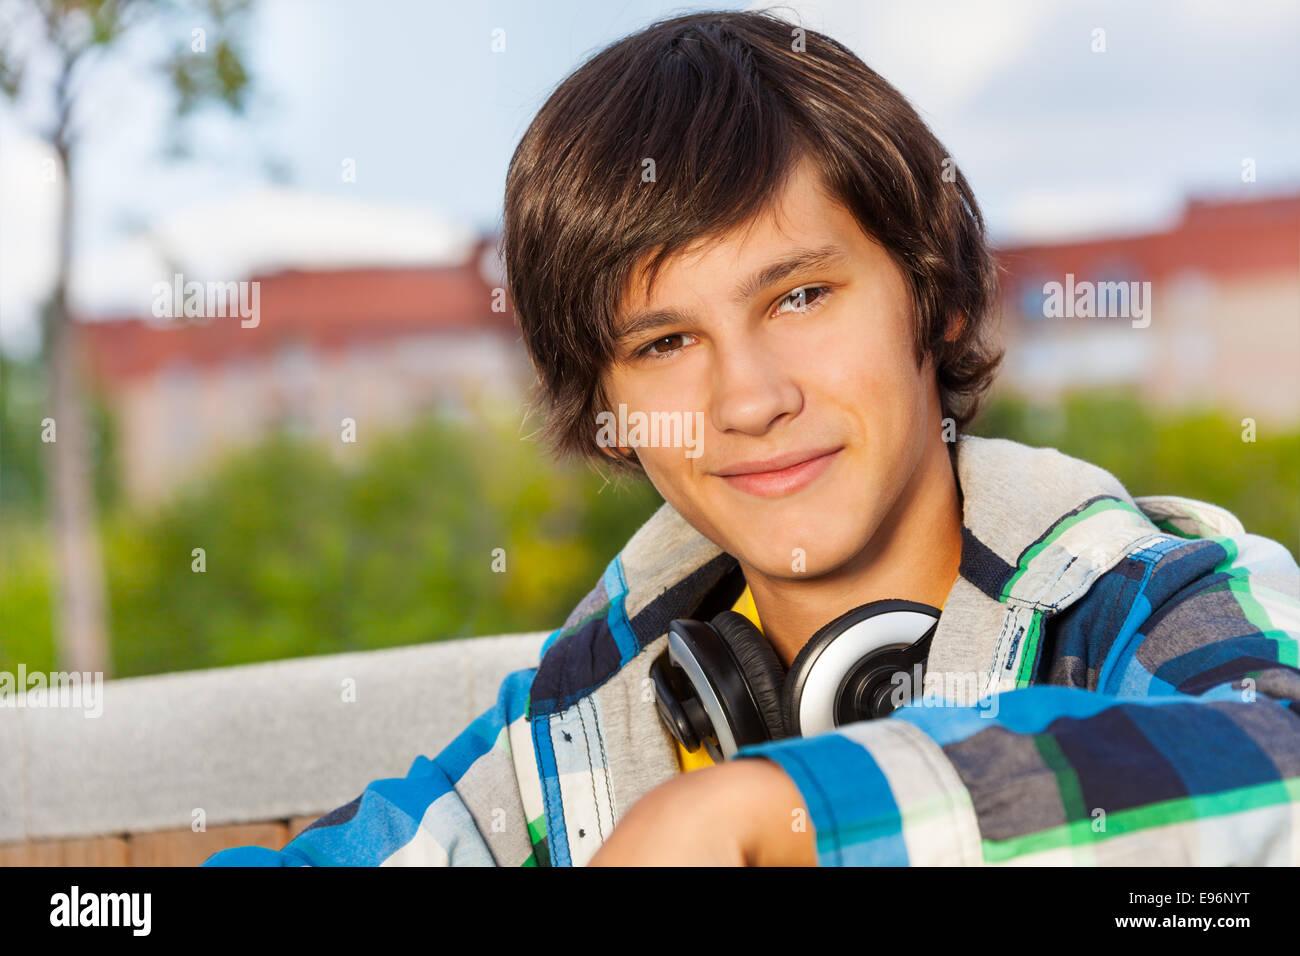 f95505f29ab Cute Teen Boy Stock Photos   Cute Teen Boy Stock Images - Alamy